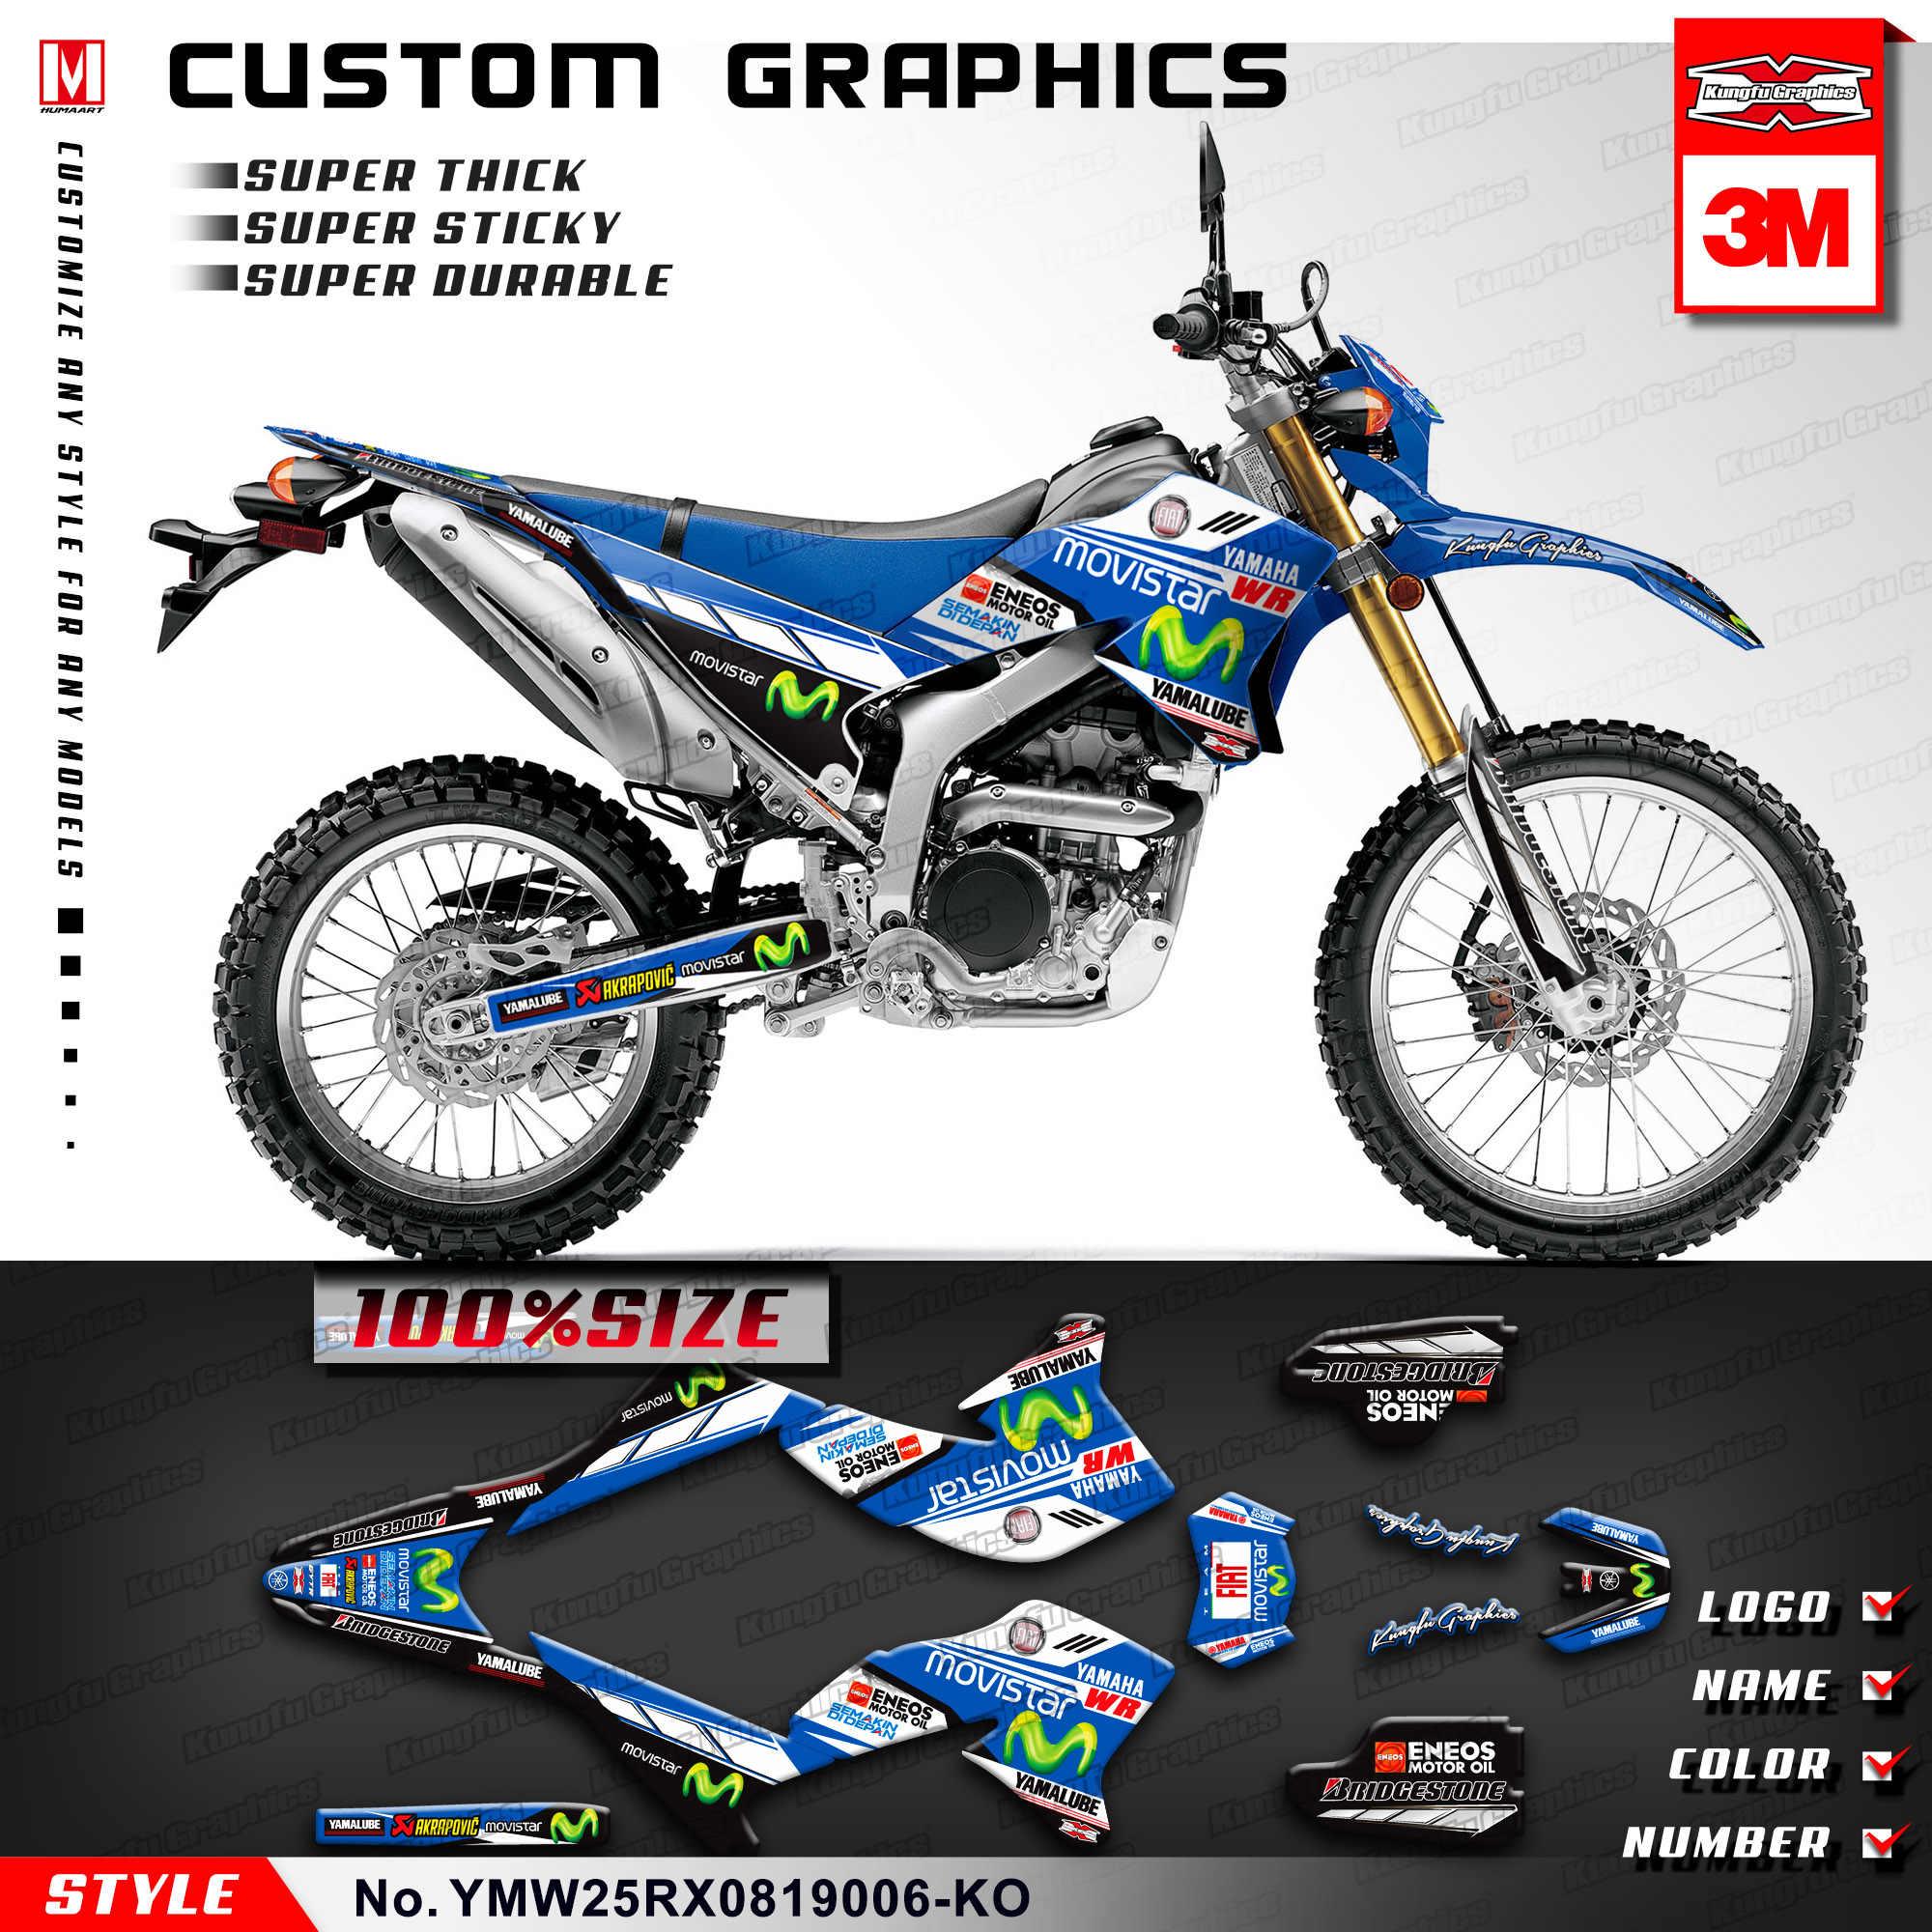 Kungfu graphics dirt bike motorcycle decals custom stickers